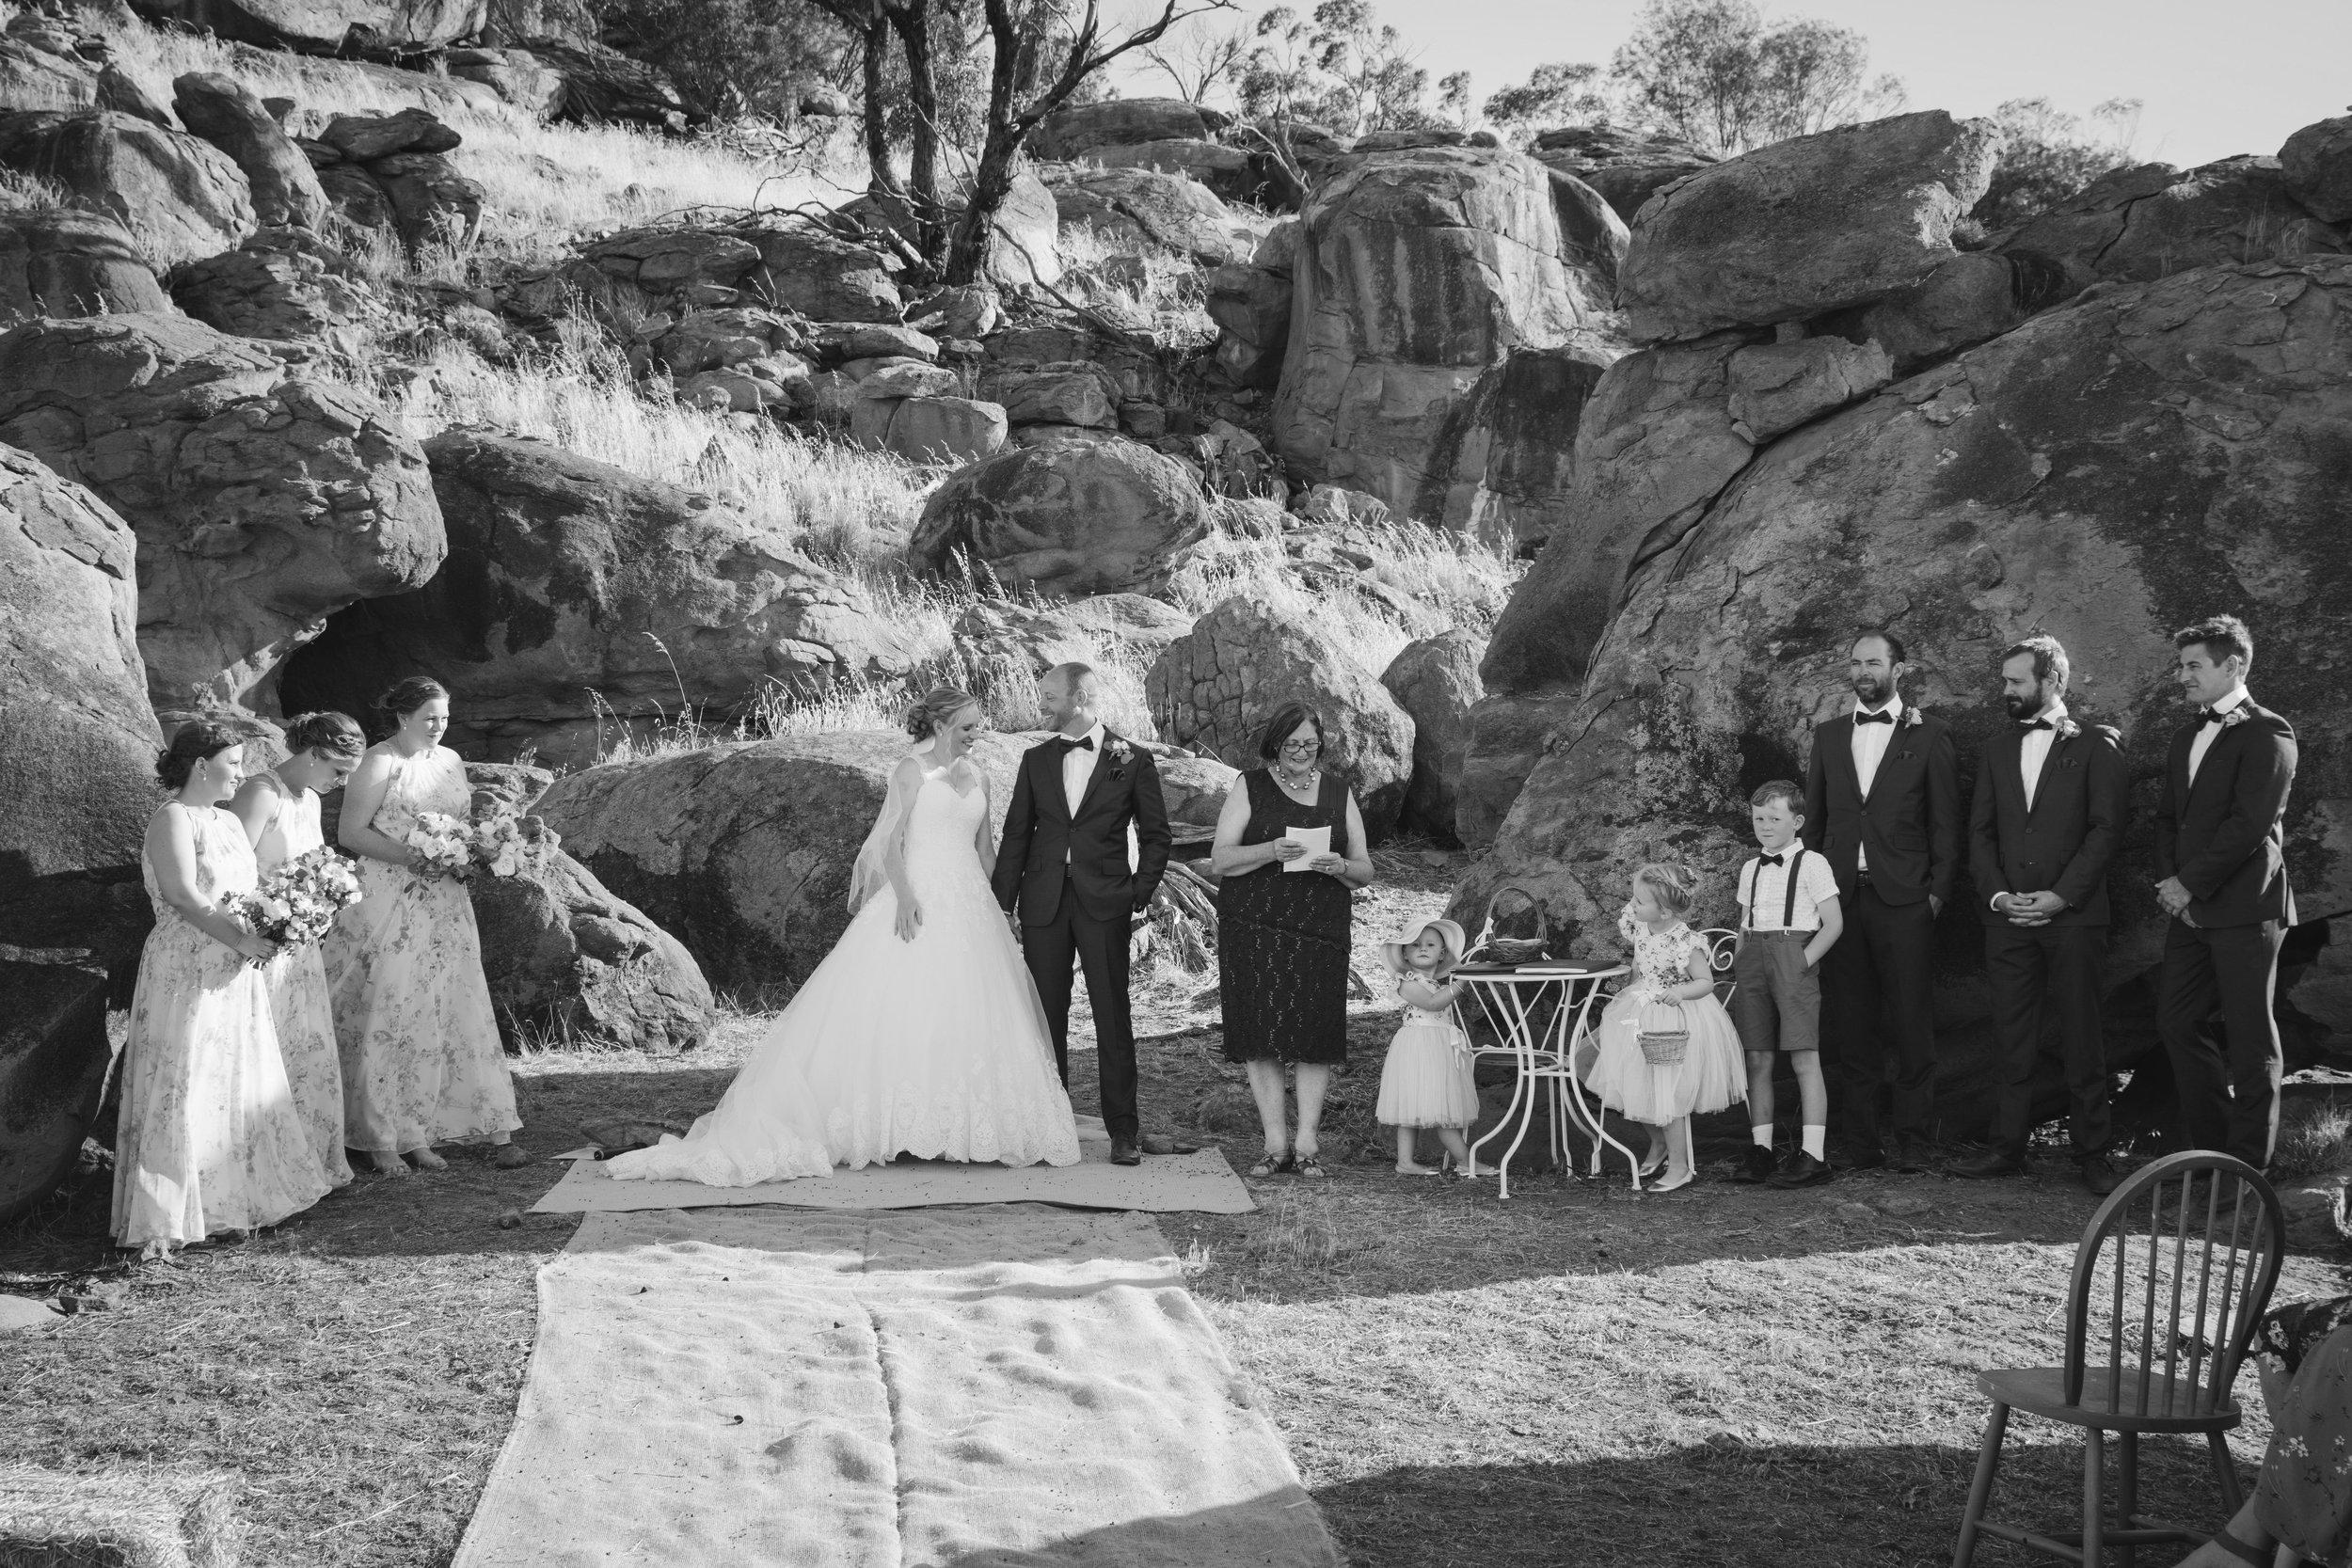 Wheatbelt Merredin Rustic Rural Farm Wedding (23).jpg